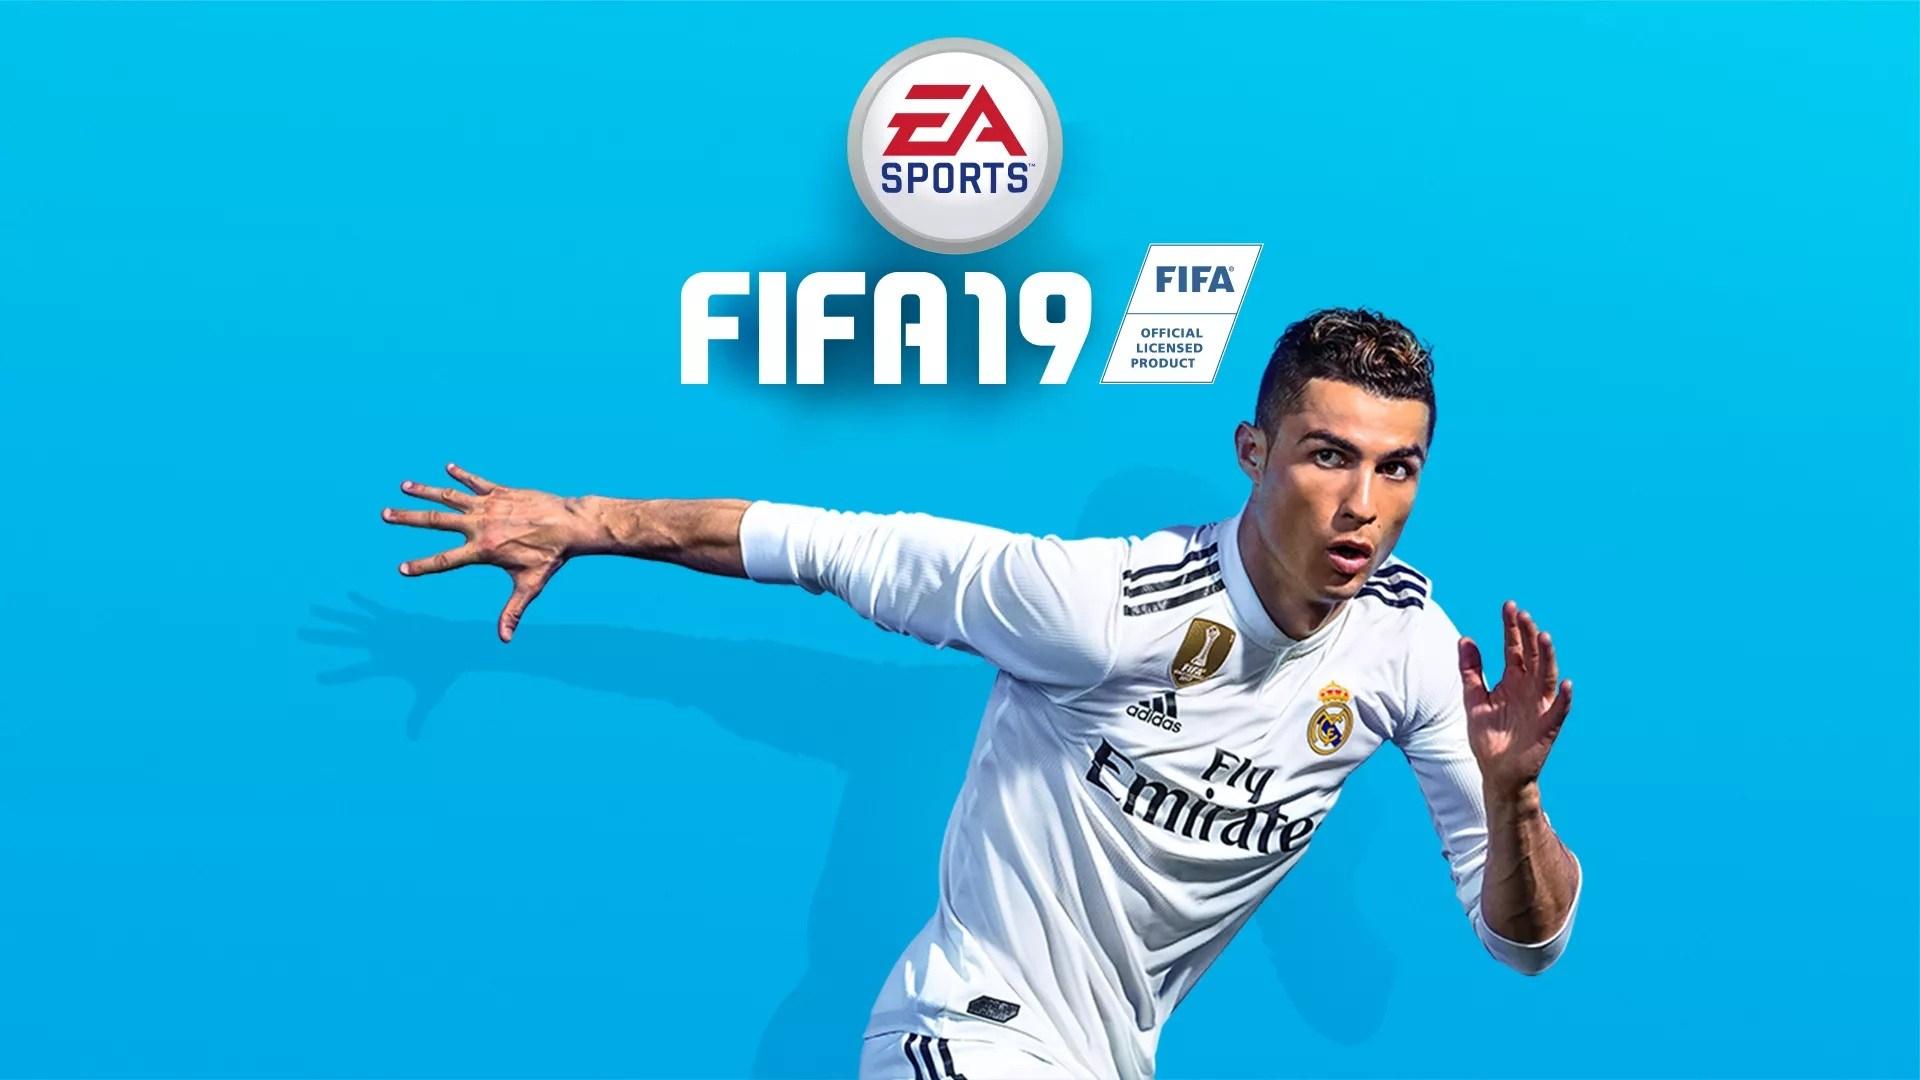 Fifa 19 Cd Key EA Sports zum Bestpreis-Kauf